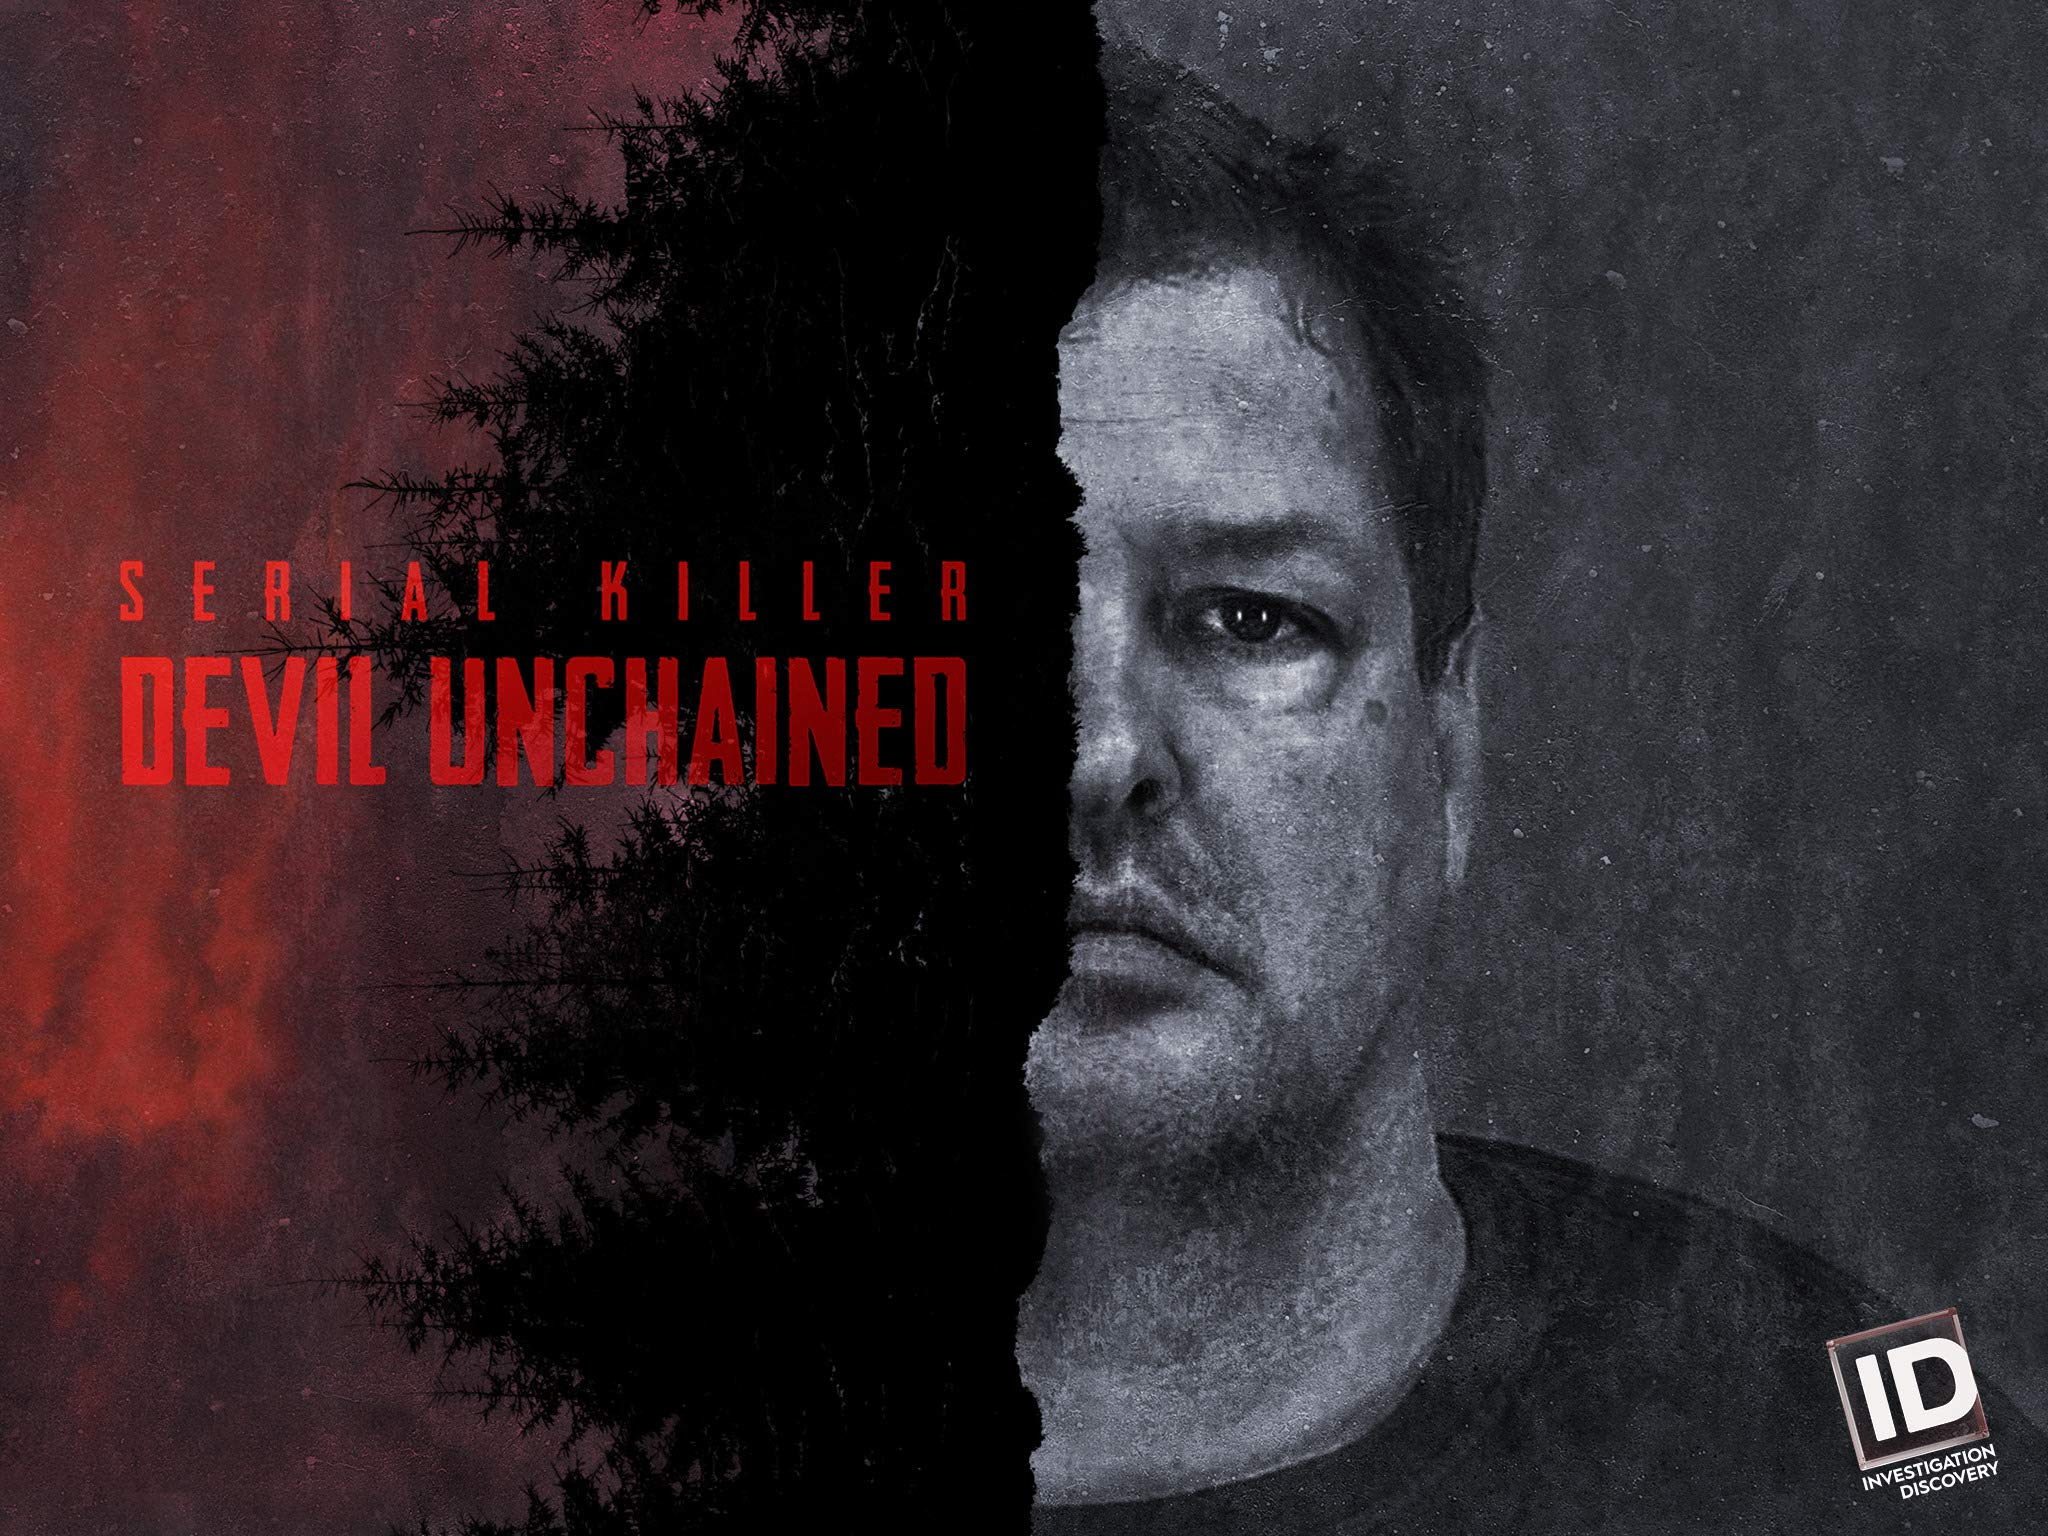 Watch Serial Killer Devil Unchained Season 1 Prime Video